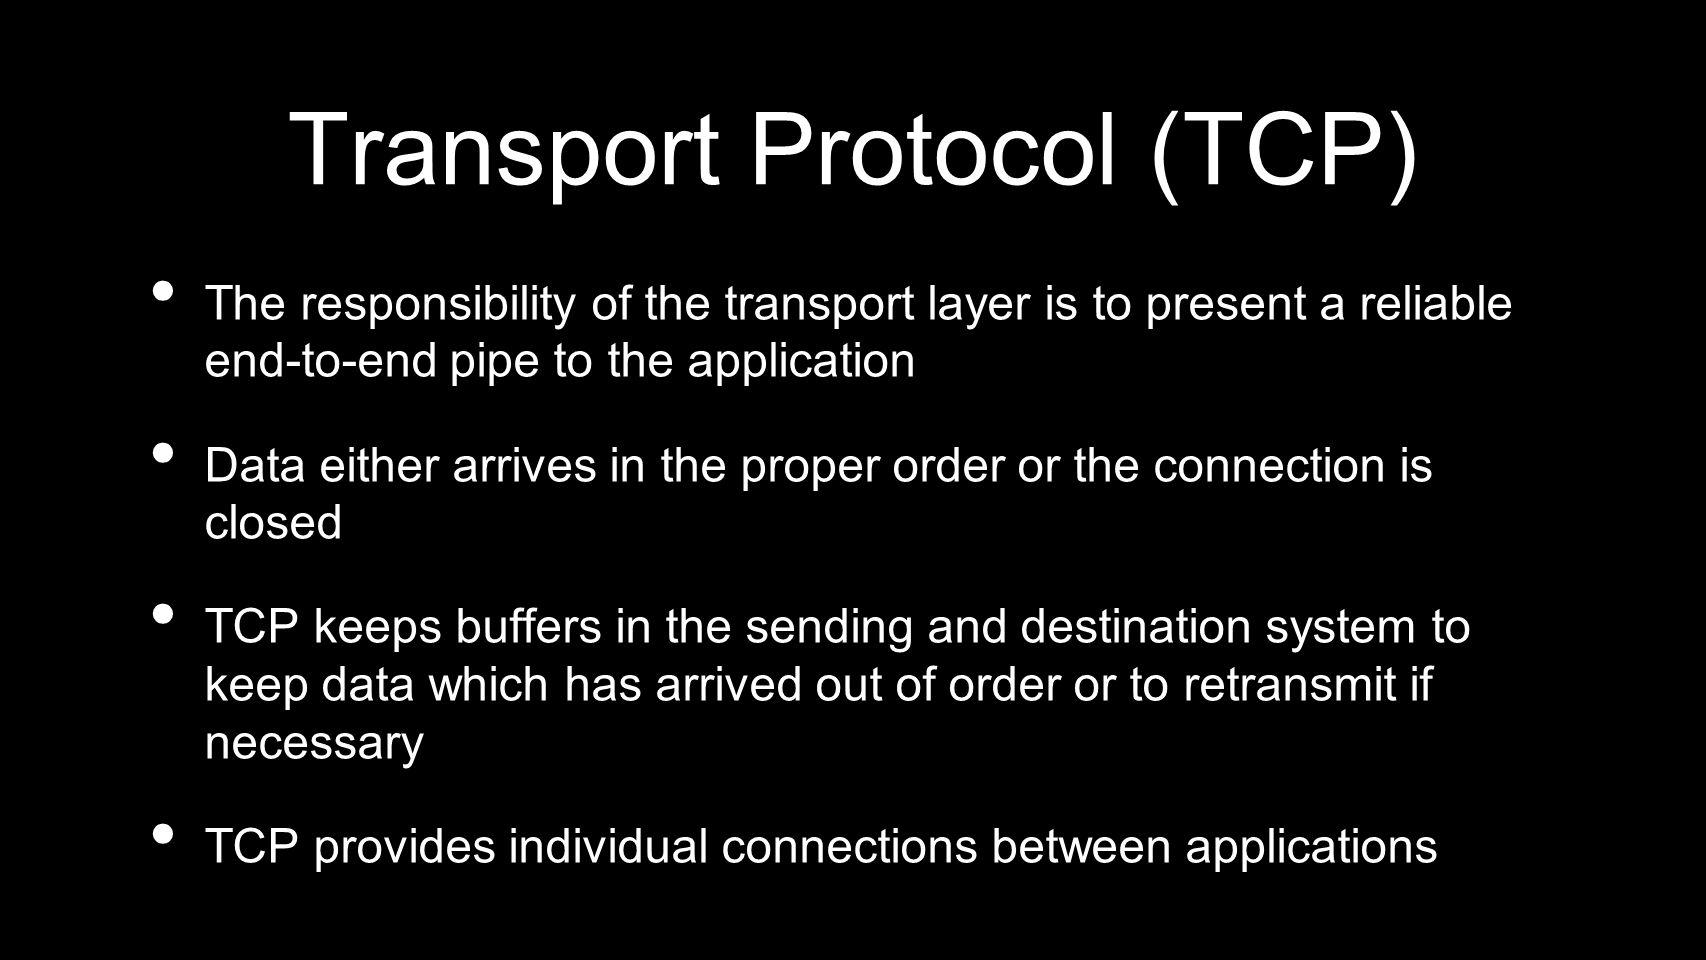 Transport Protocol (TCP)